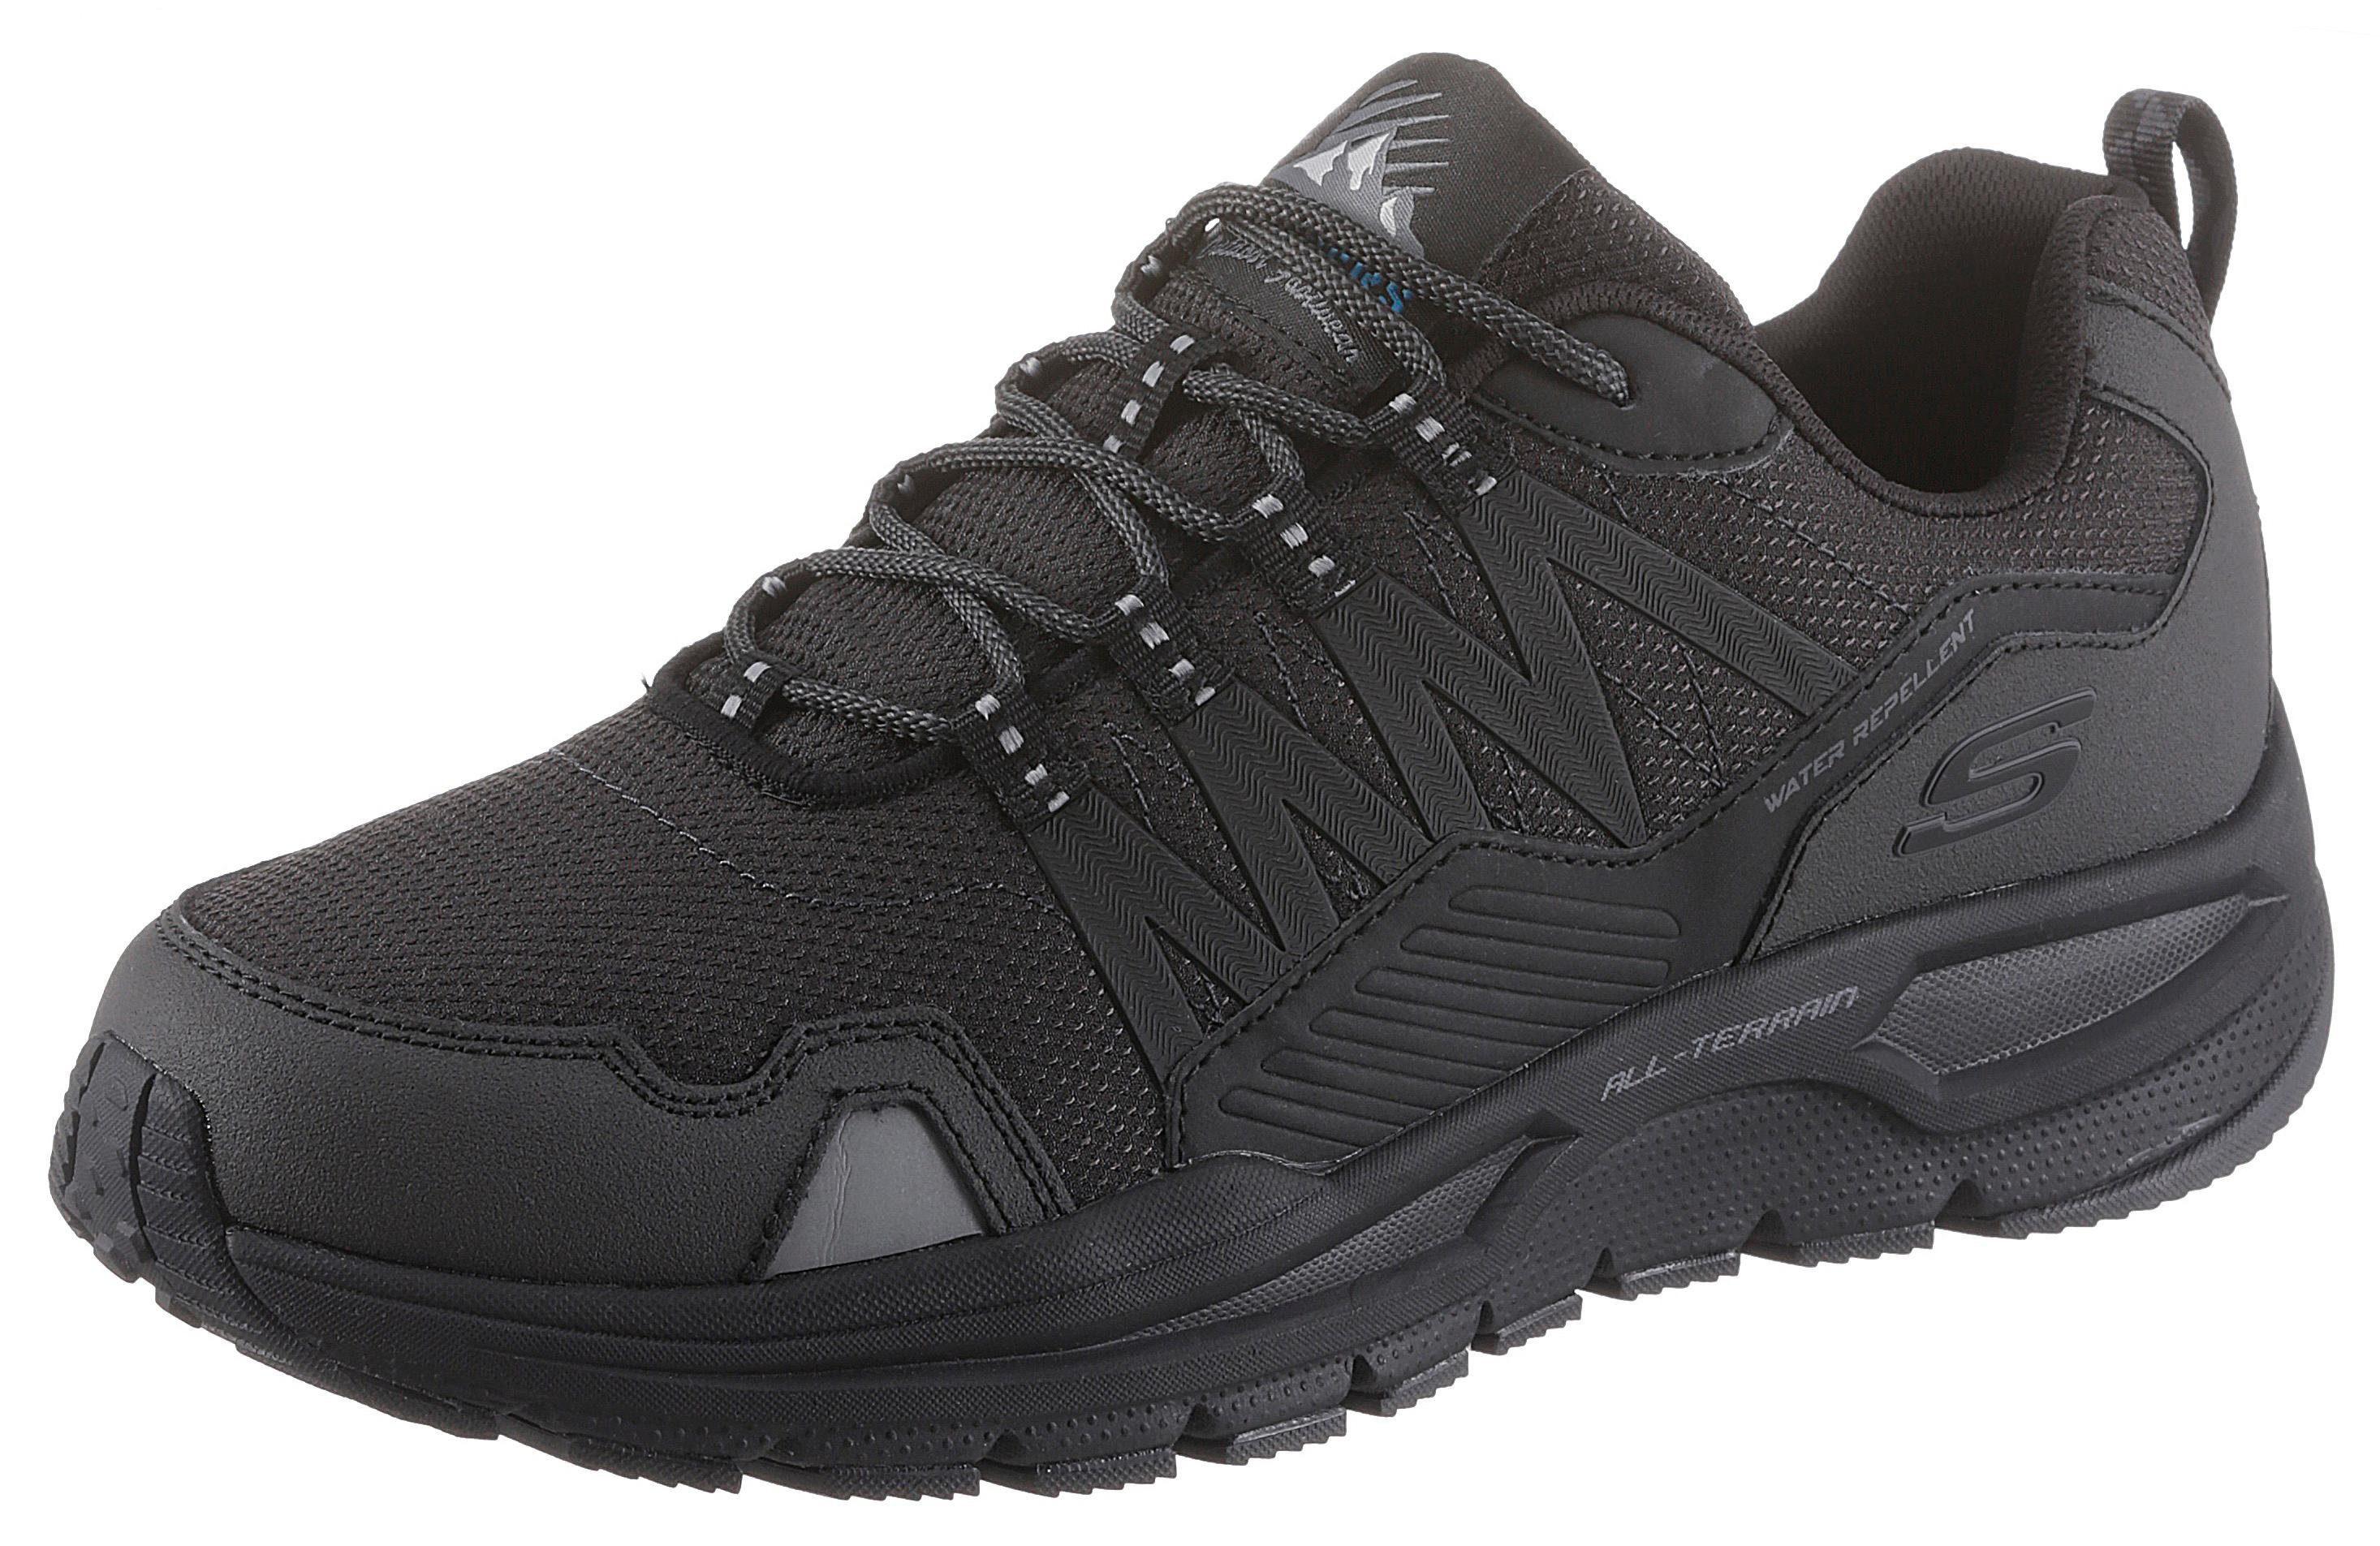 Skechers »Escape Plan 2.0« Sneaker mit Air Cooled Memory Foam online kaufen   OTTO